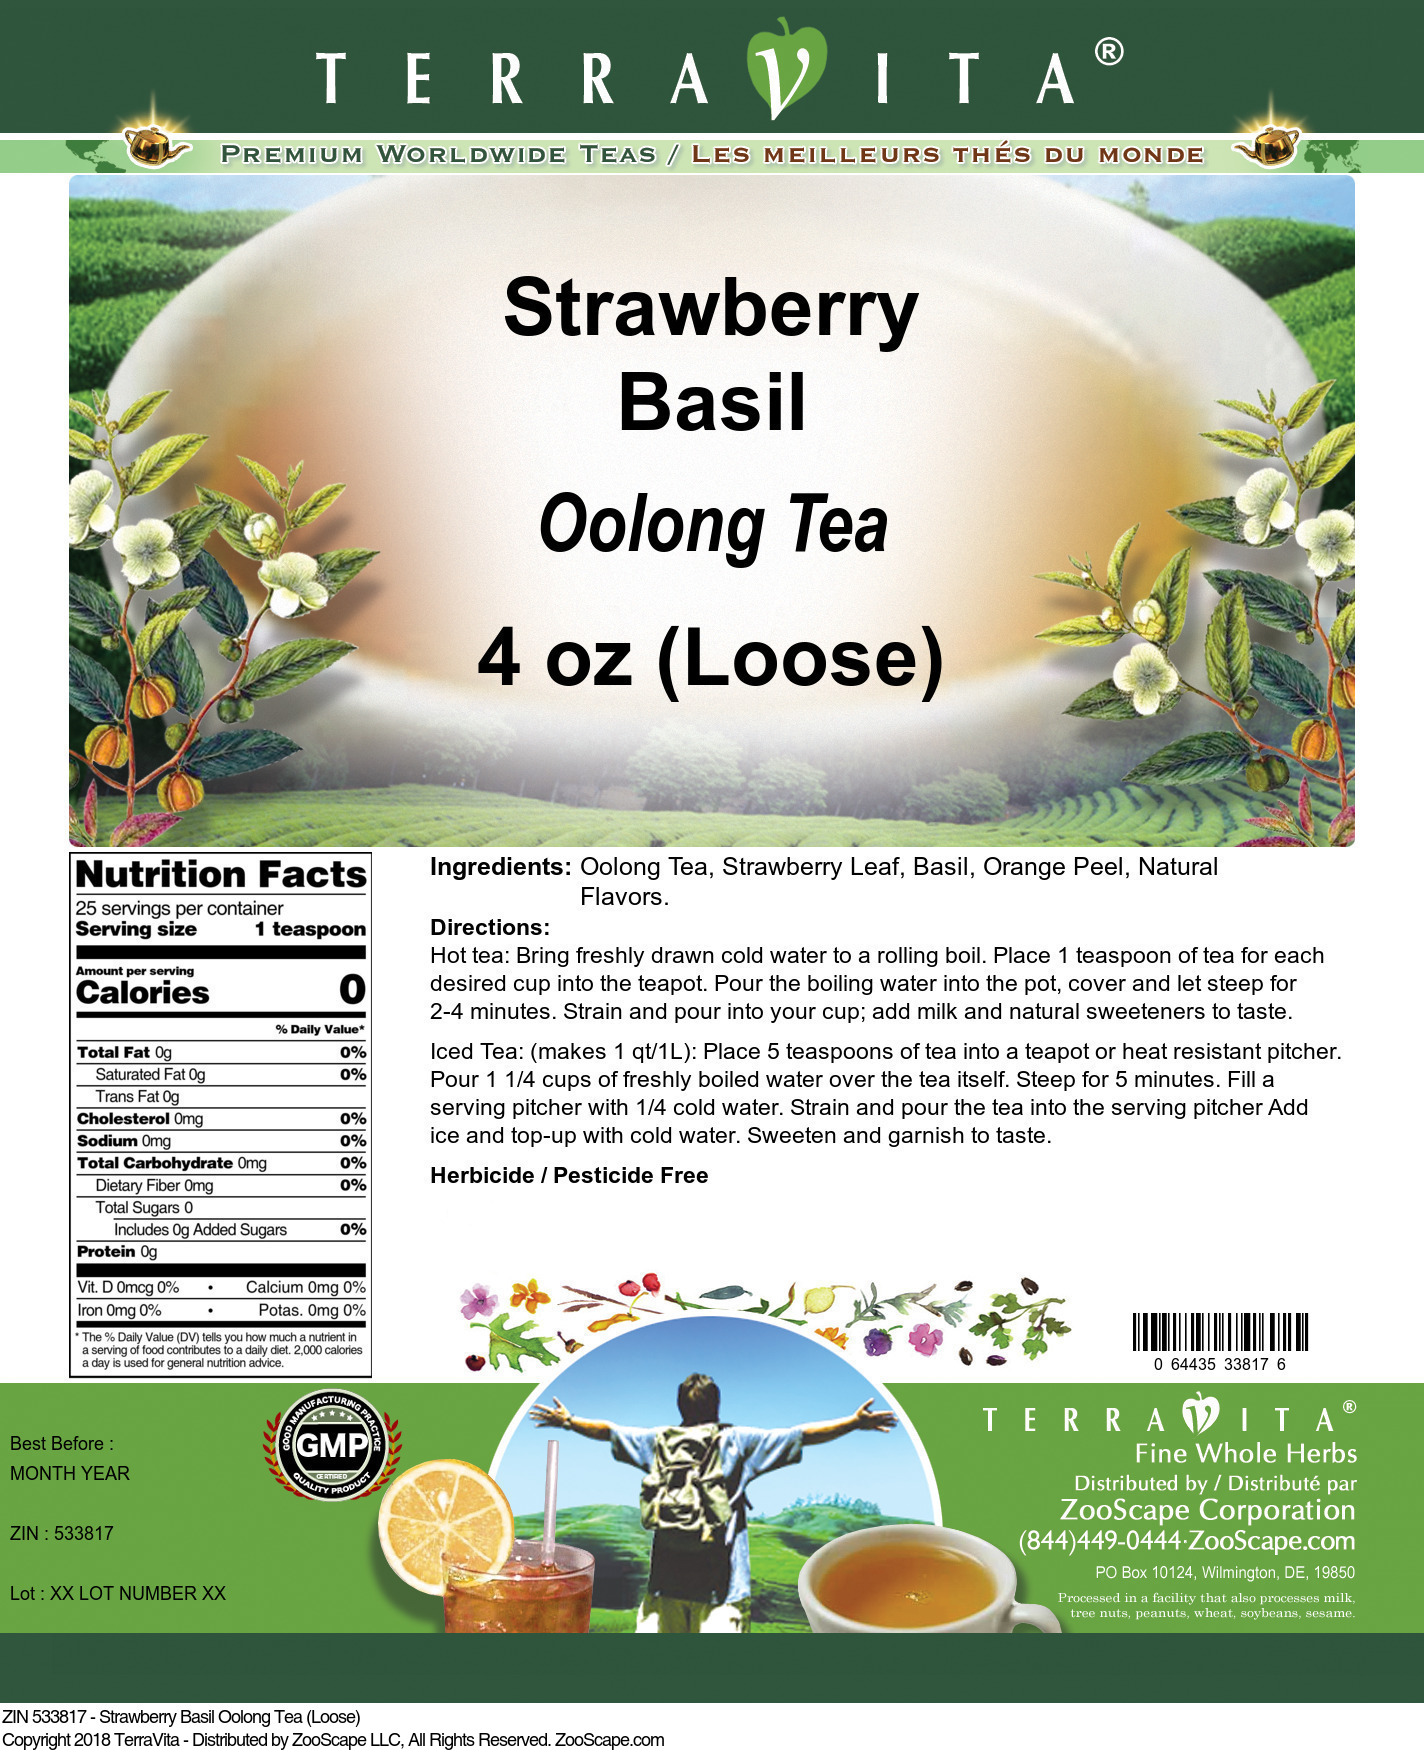 Strawberry Basil Oolong Tea